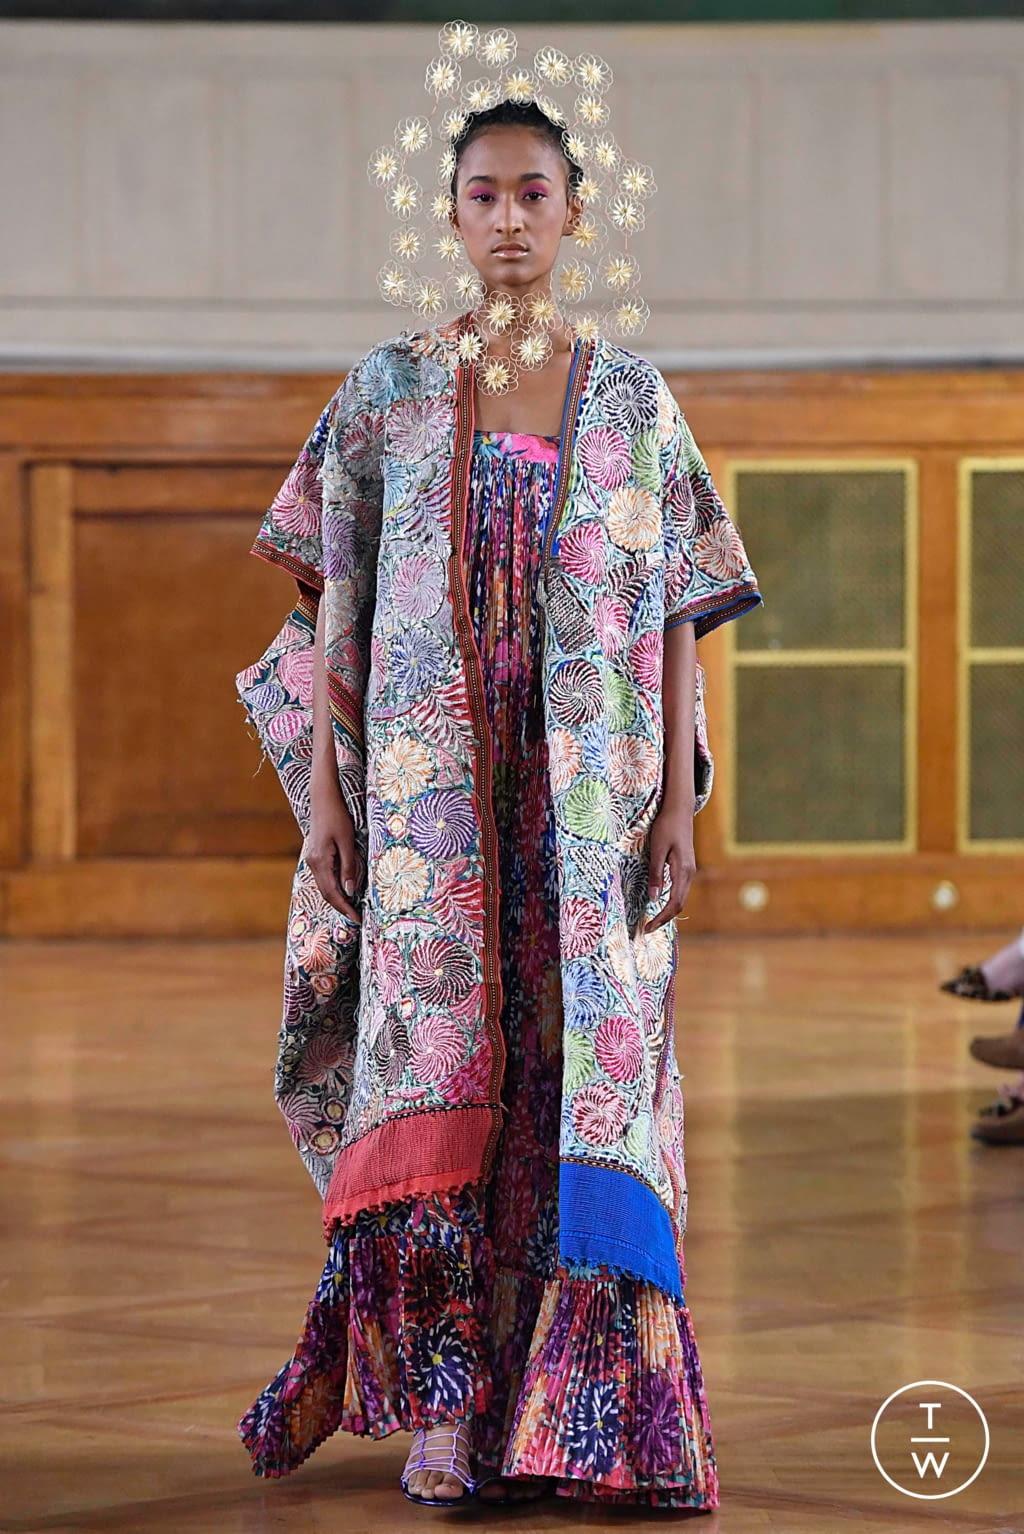 Fashion Week Paris Fall/Winter 2019 look 7 de la collection Maurizio Galante couture